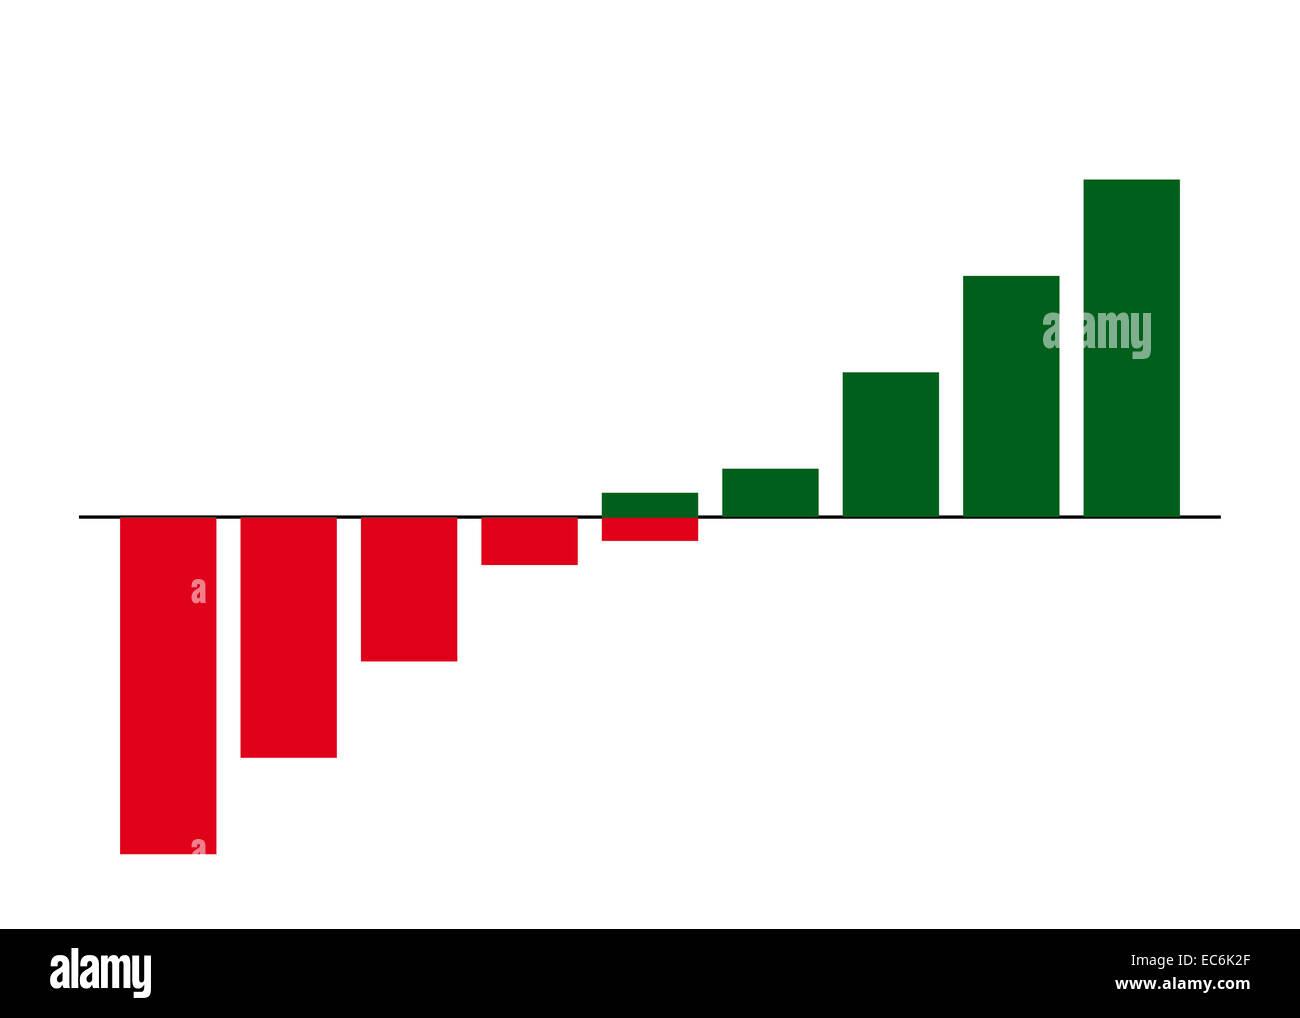 Illustrated Diagram Stockfotos & Illustrated Diagram Bilder - Alamy